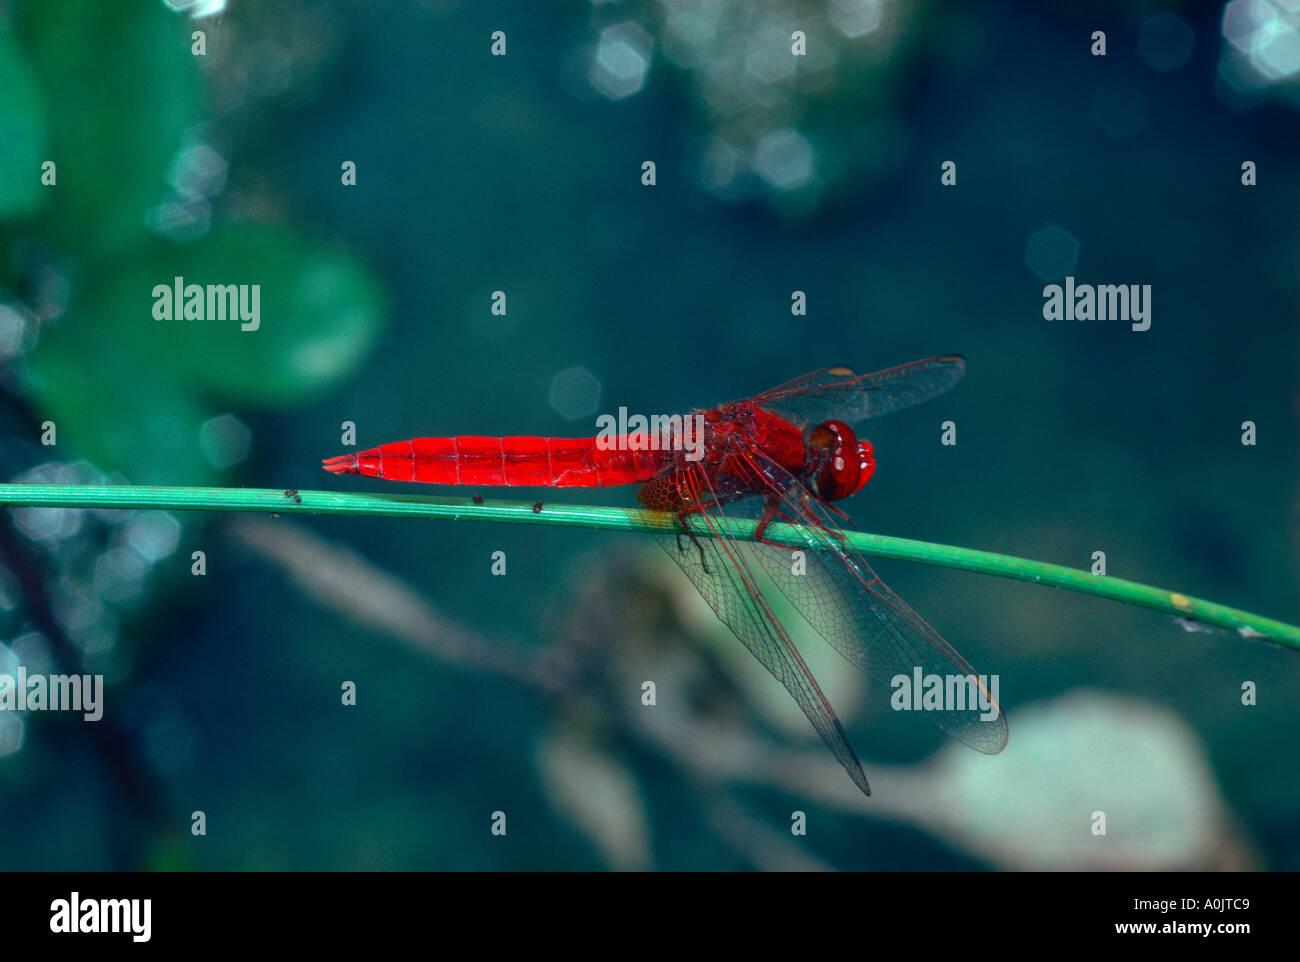 Scarlet Darter Dragonfly, Crocothemis erythraea. At rest on stem Stock Photo